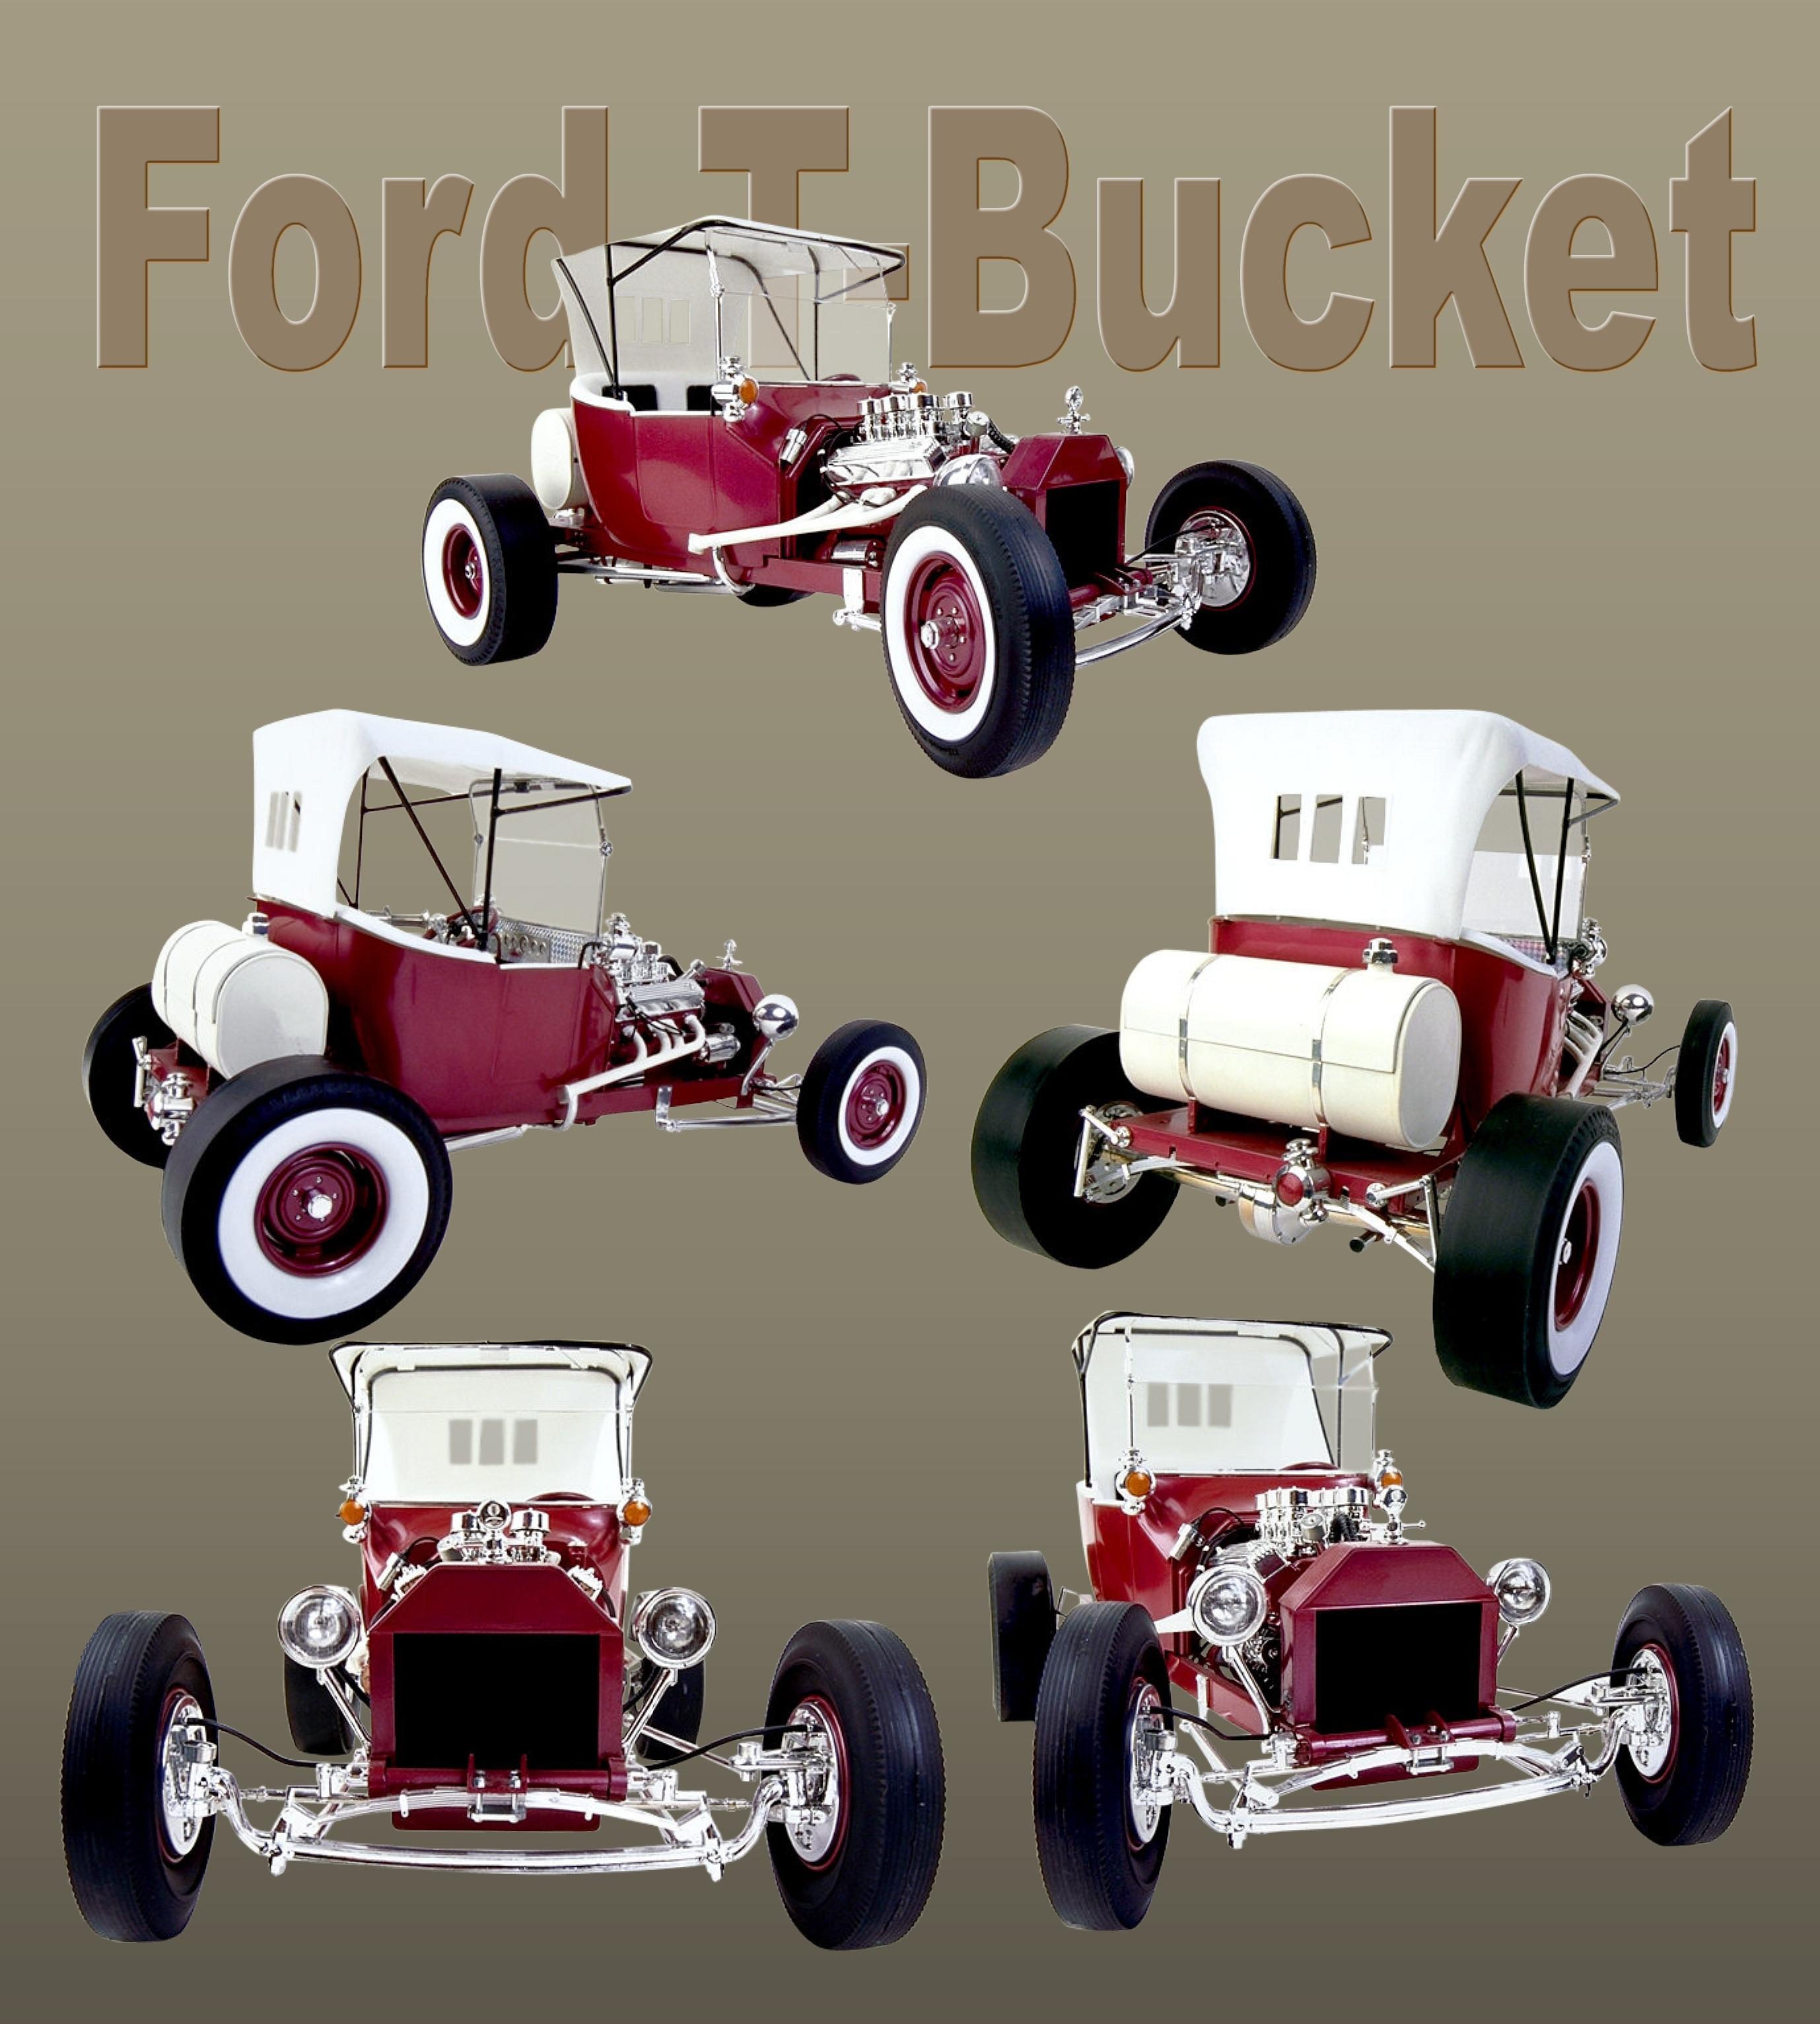 Ford T-Bucket, Auto, Automobile, Bucket, Car, HQ Photo